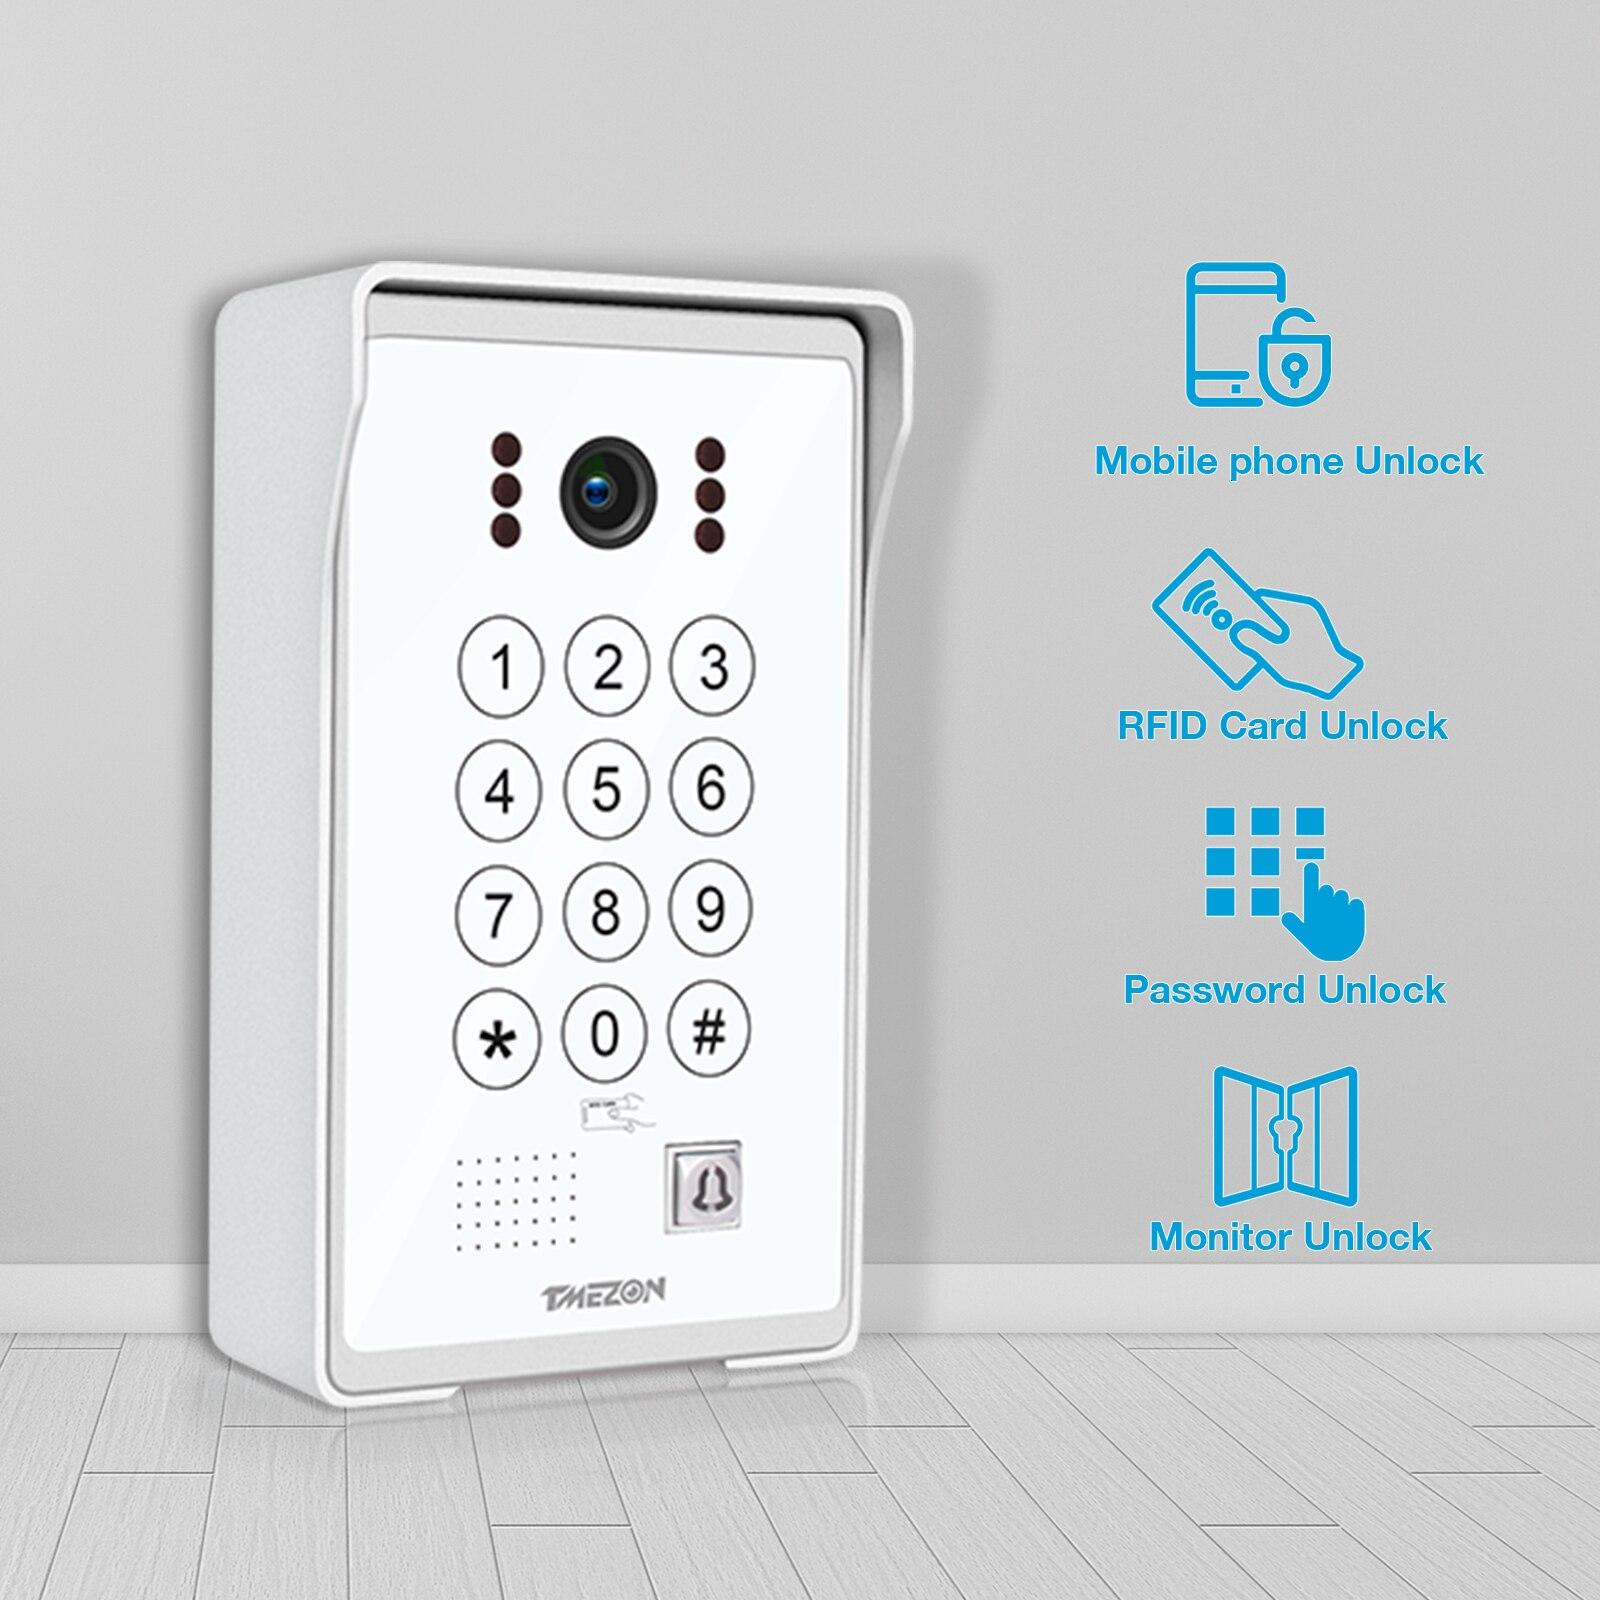 TUYA APP TMEZON 7 Inch 960P Video Door Phone Intercom System with Wired Doorbell Camera, APP AND monitor Unlock,Code Keypad RFID enlarge